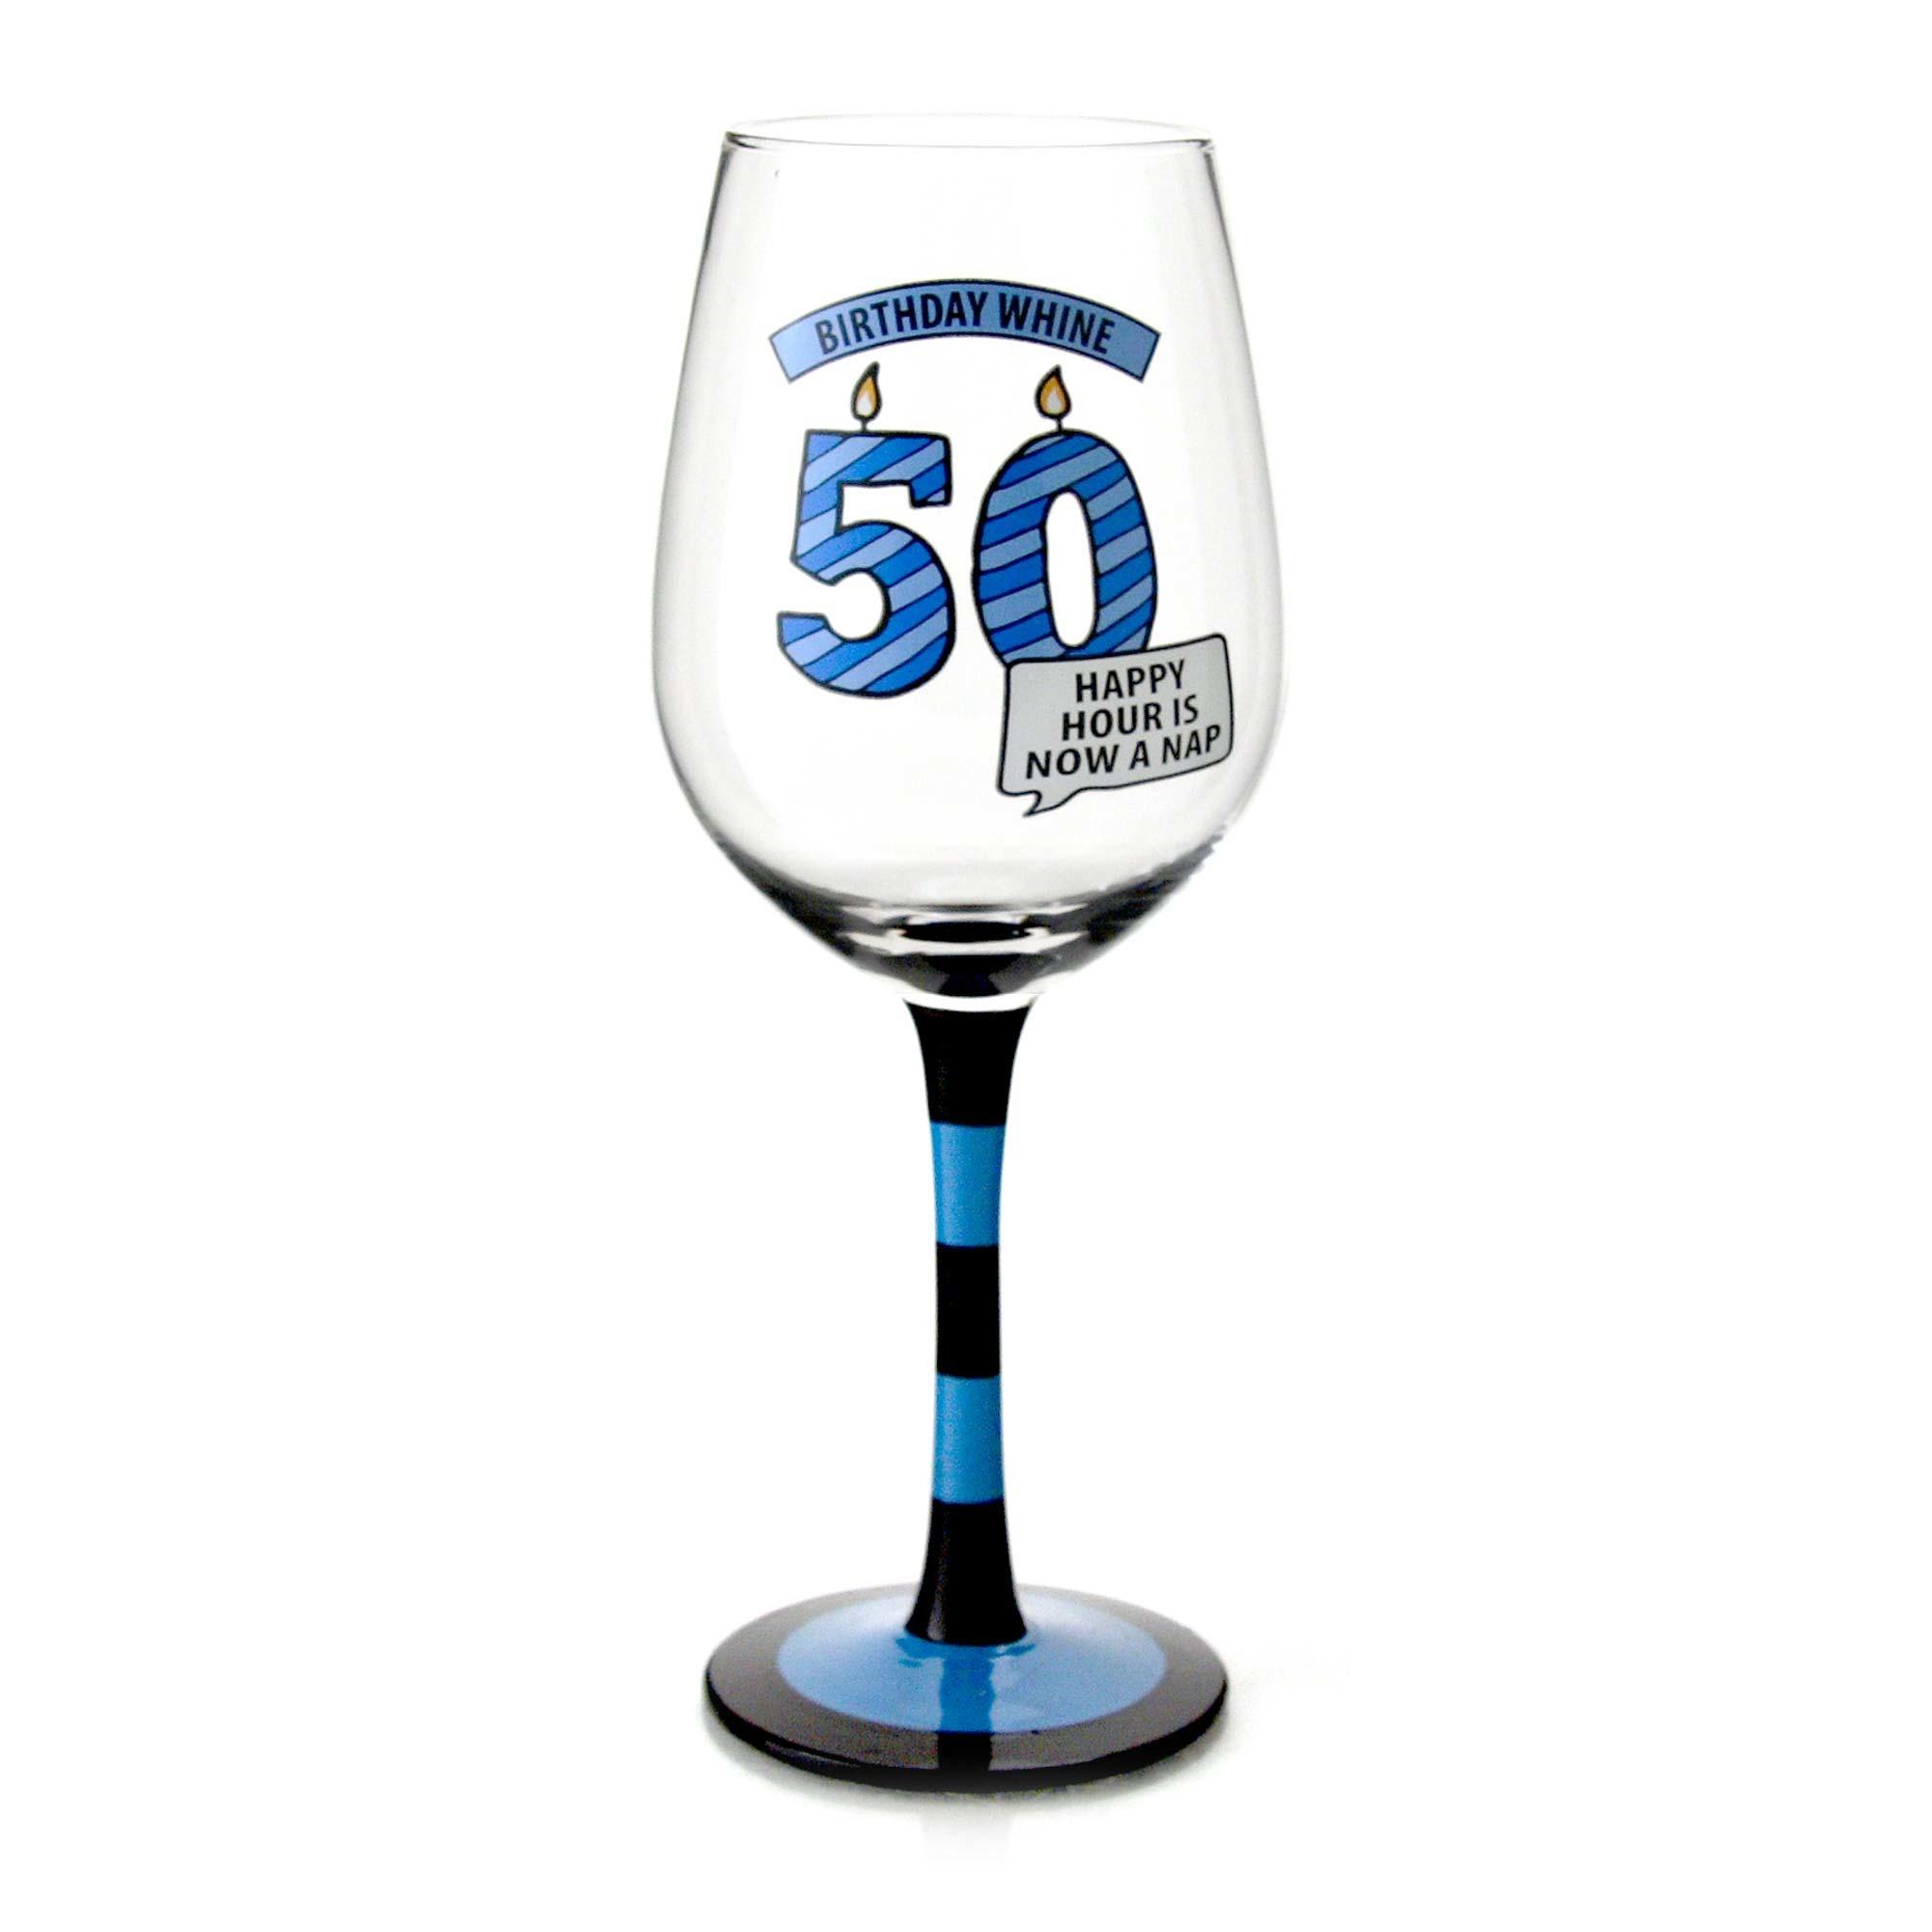 Goblet 50 - Birthday Wine Glass 50